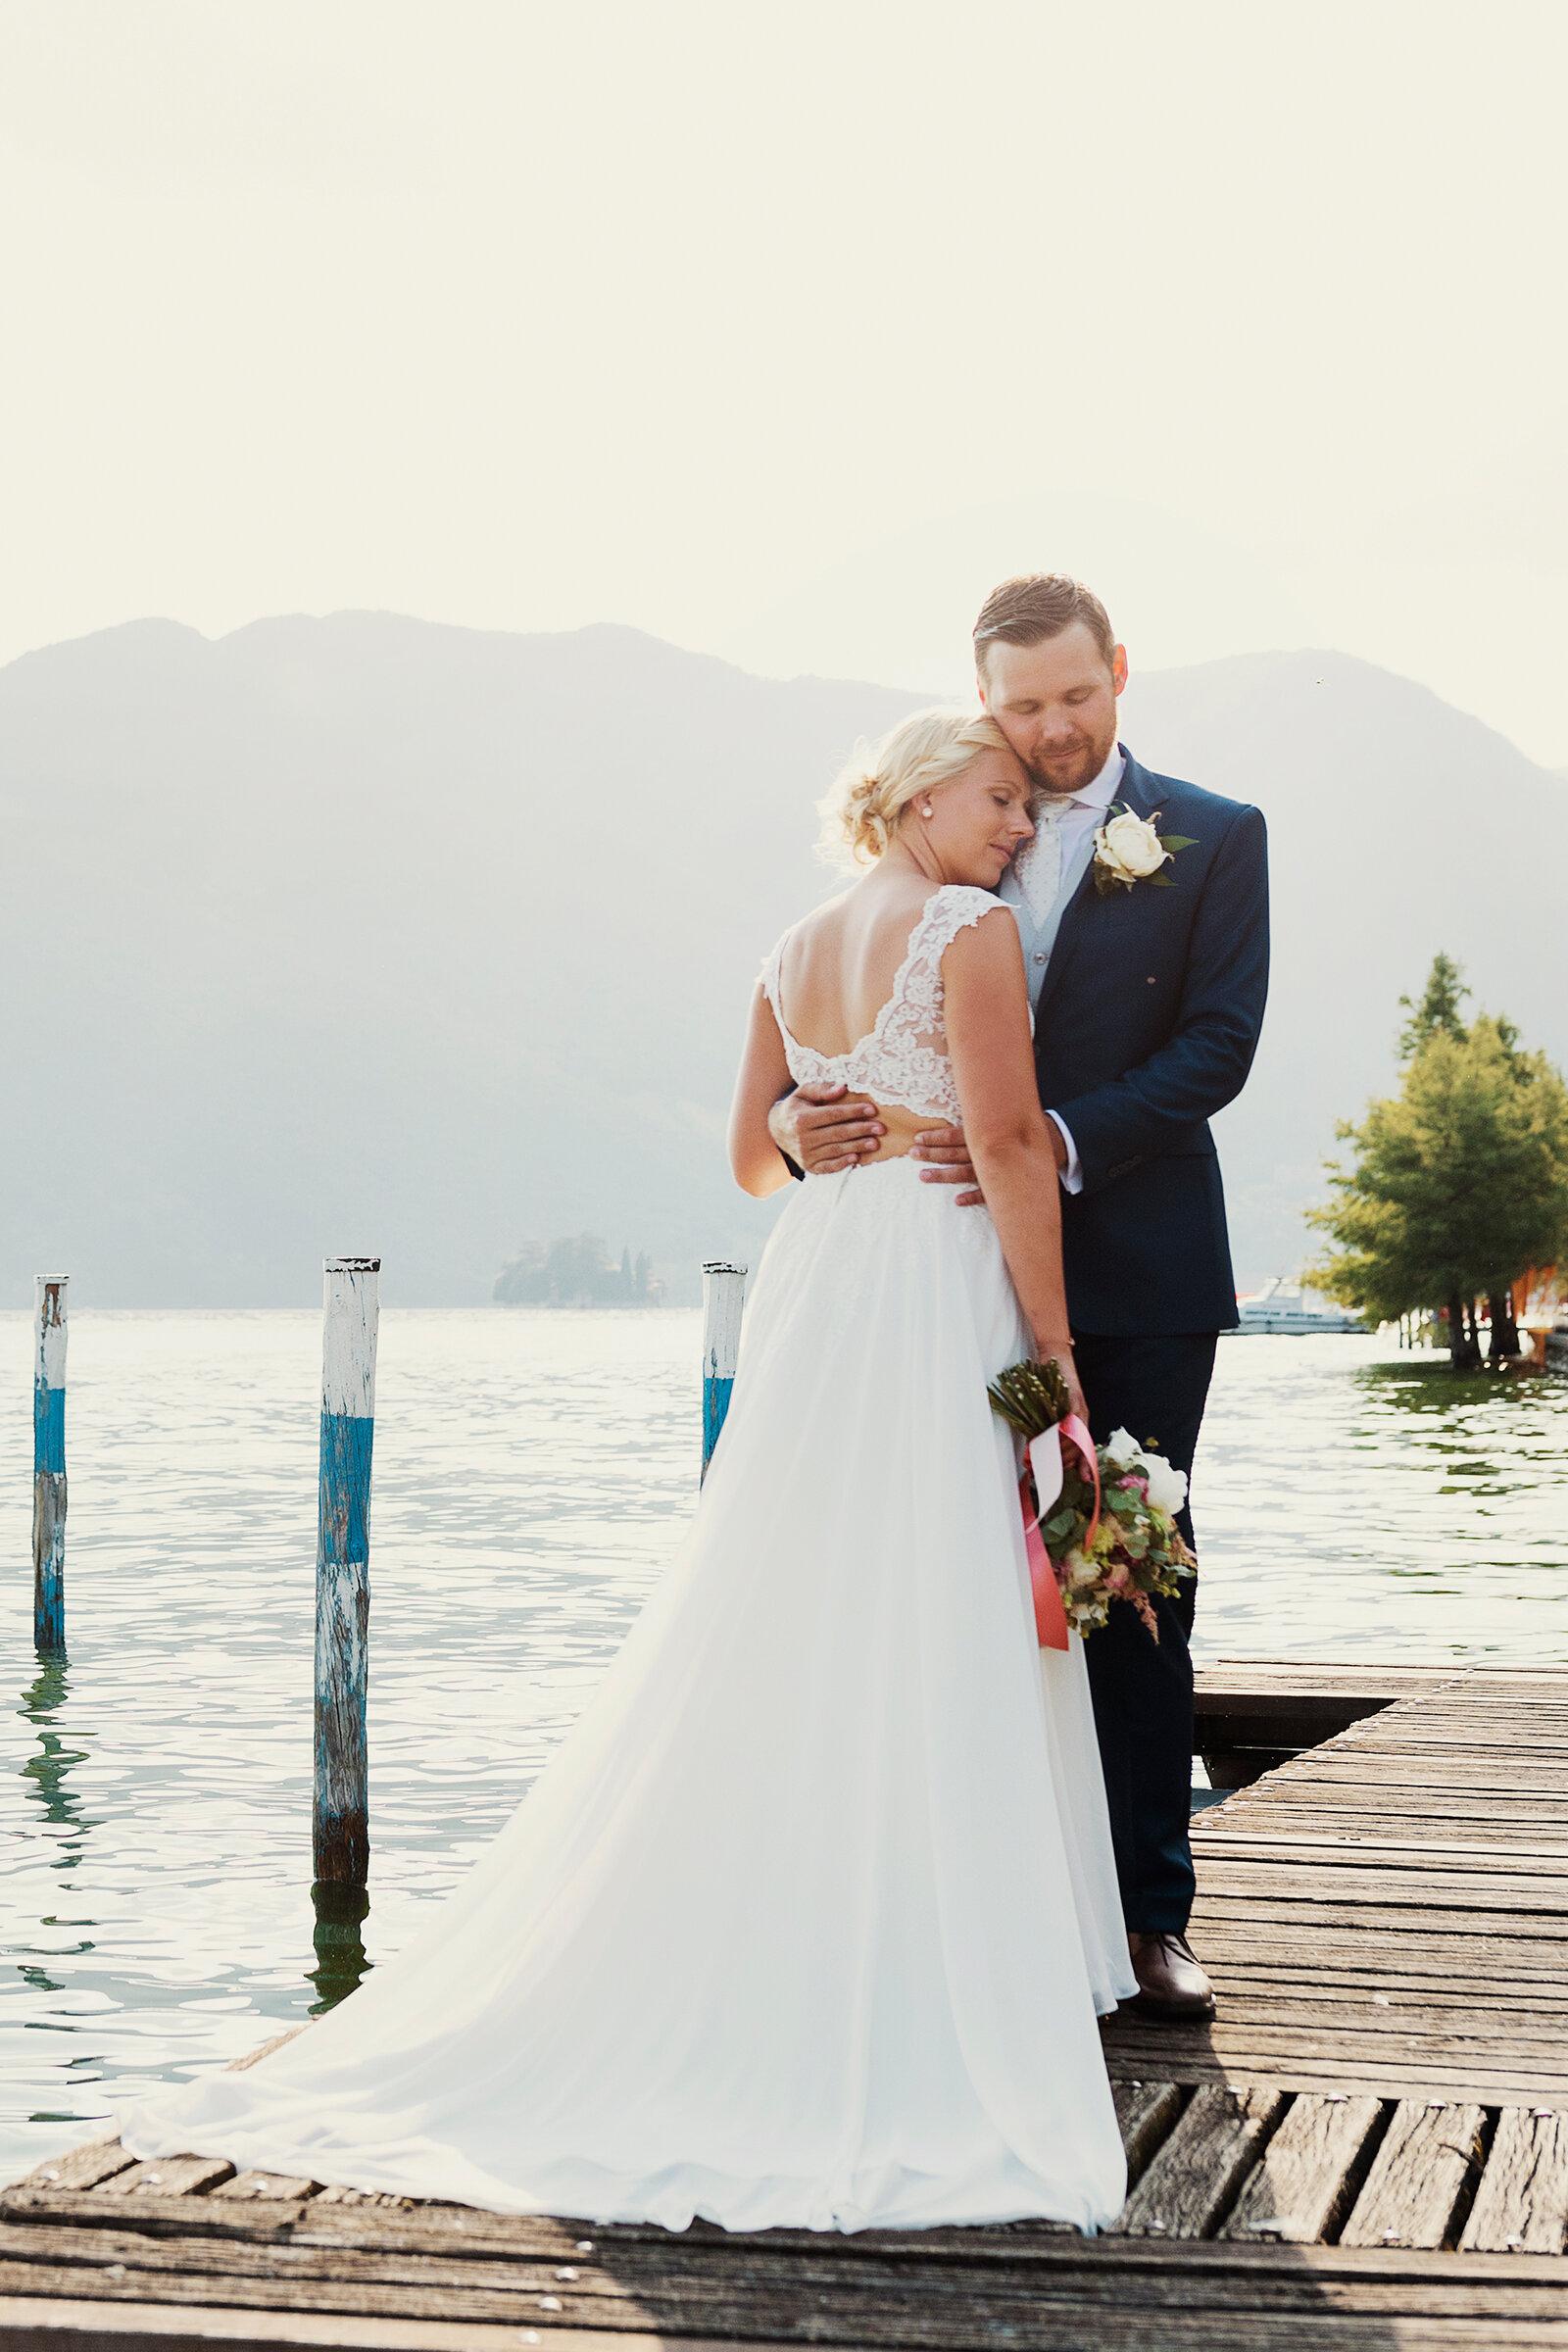 Erika och Bernhard - Monte Isola, Italien